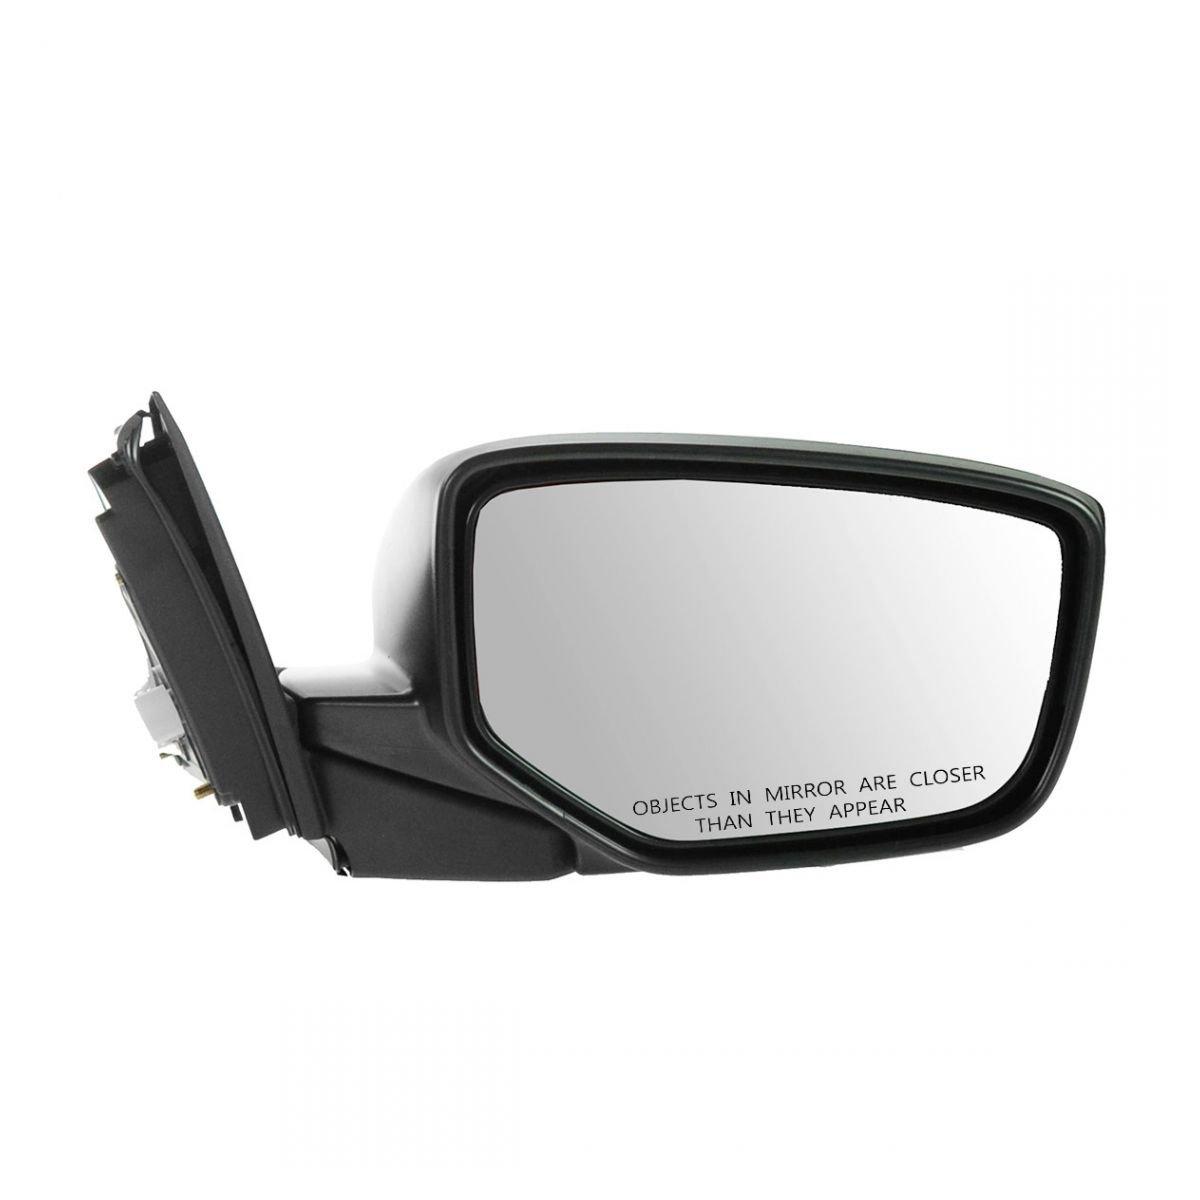 HO1321227 Mirror for 08-12 Honda Accord Passenger Side